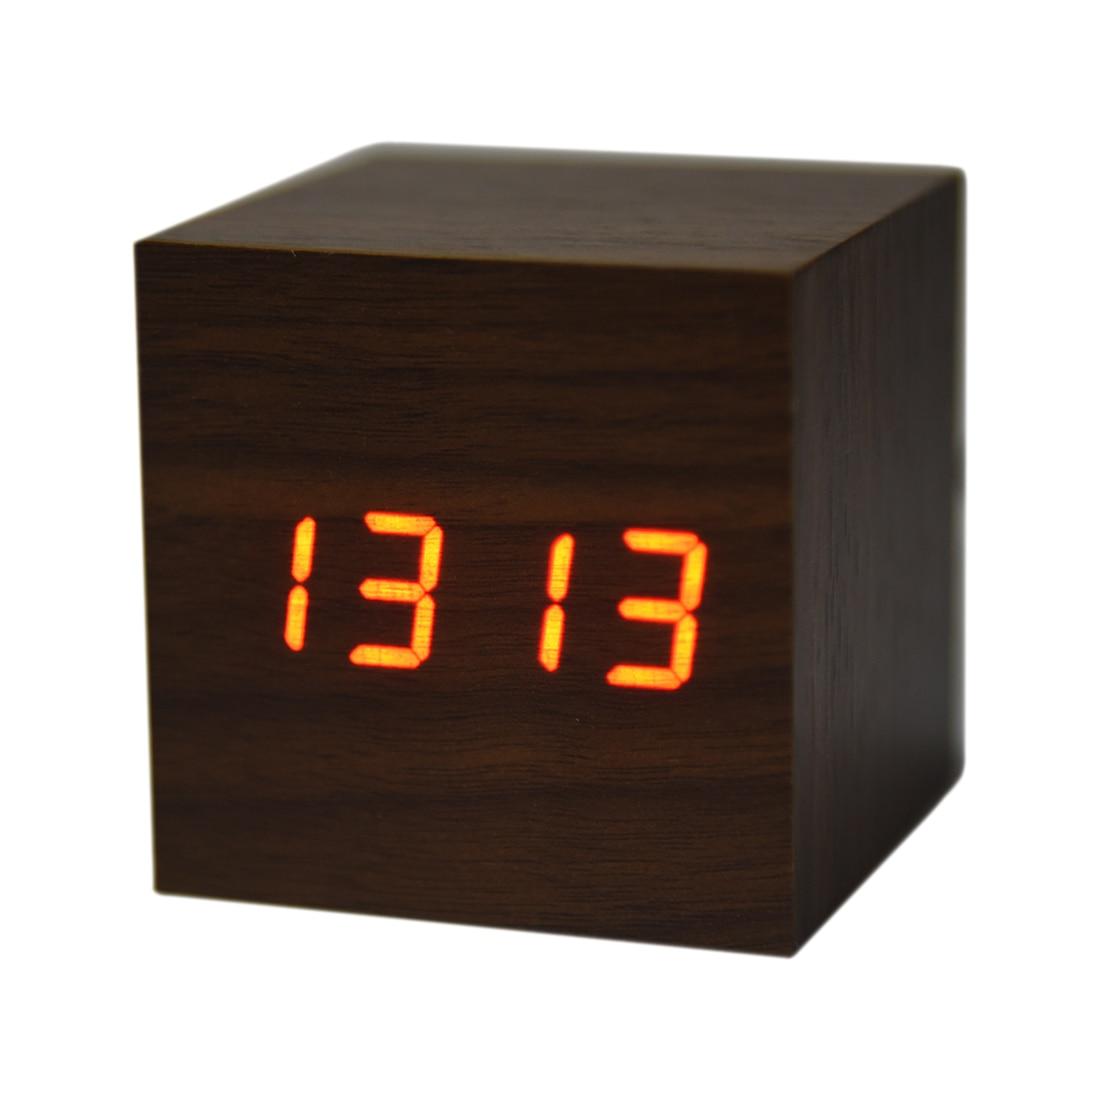 3 x AAA USB Powered Mini Wooden Clock LED Digital Desktop Alarm Clock Brown